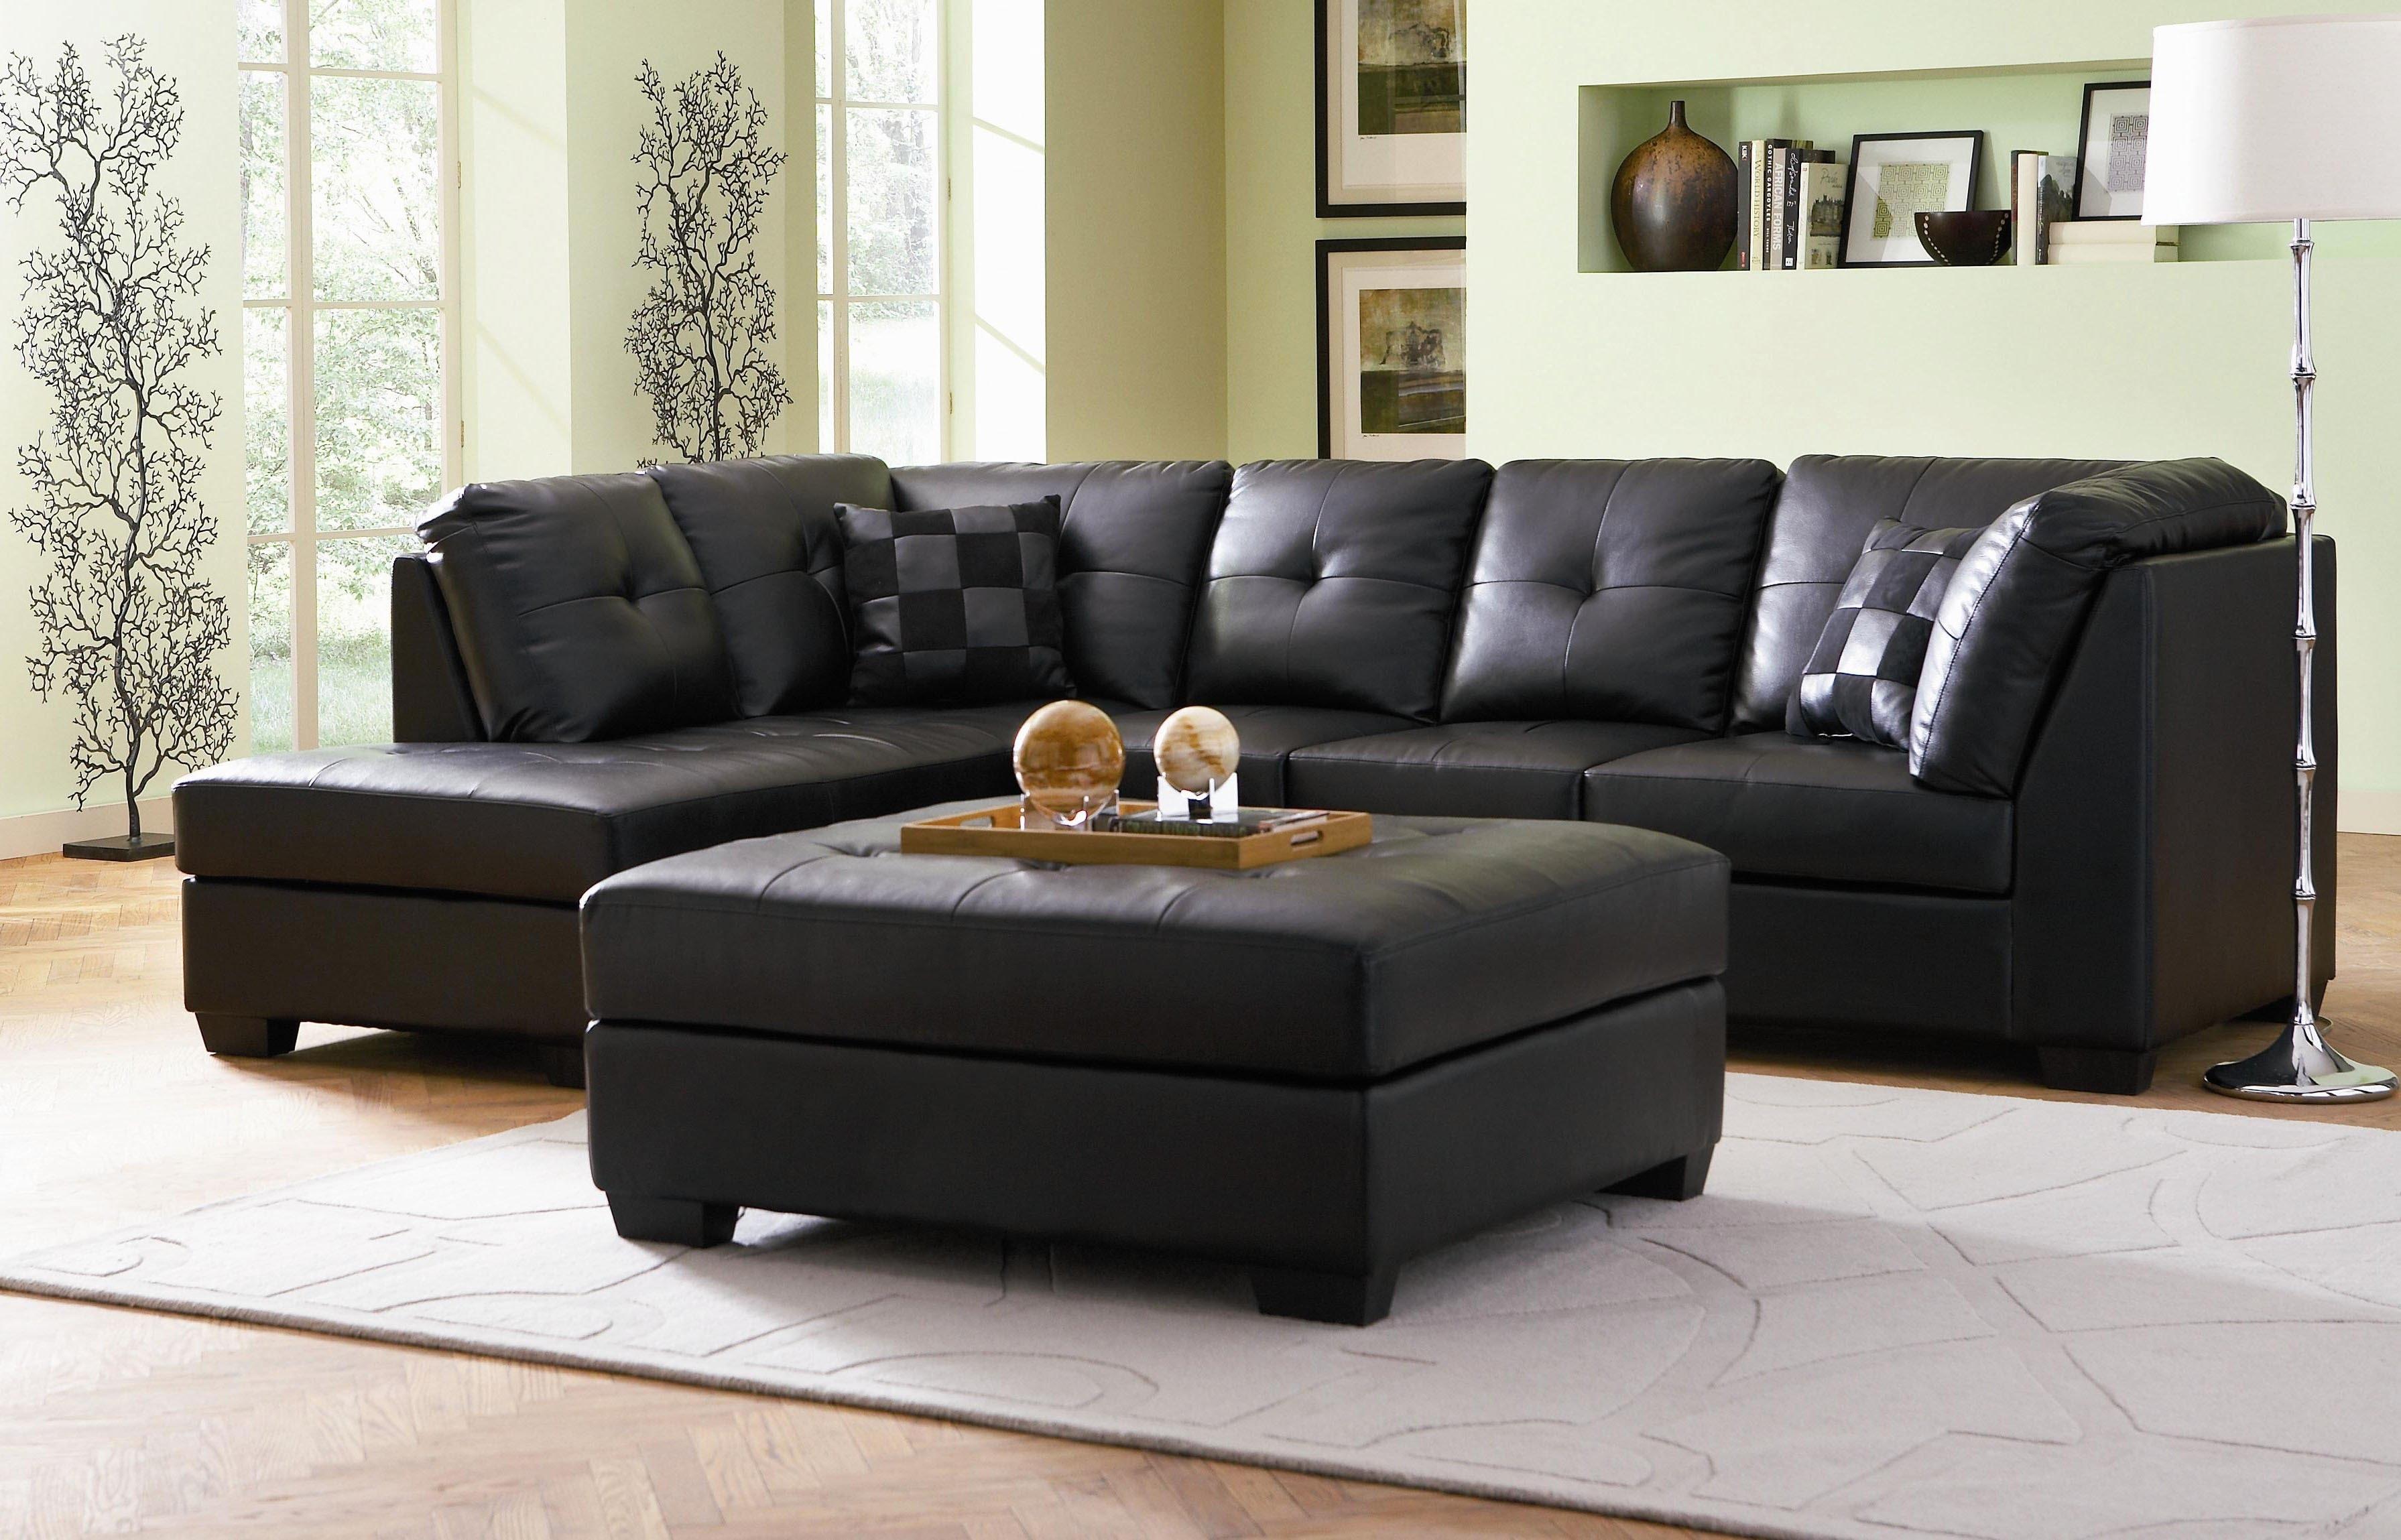 Amazon Com Sofas | Aifaresidency With Regard To Sectional Sofas At Amazon (Image 1 of 10)